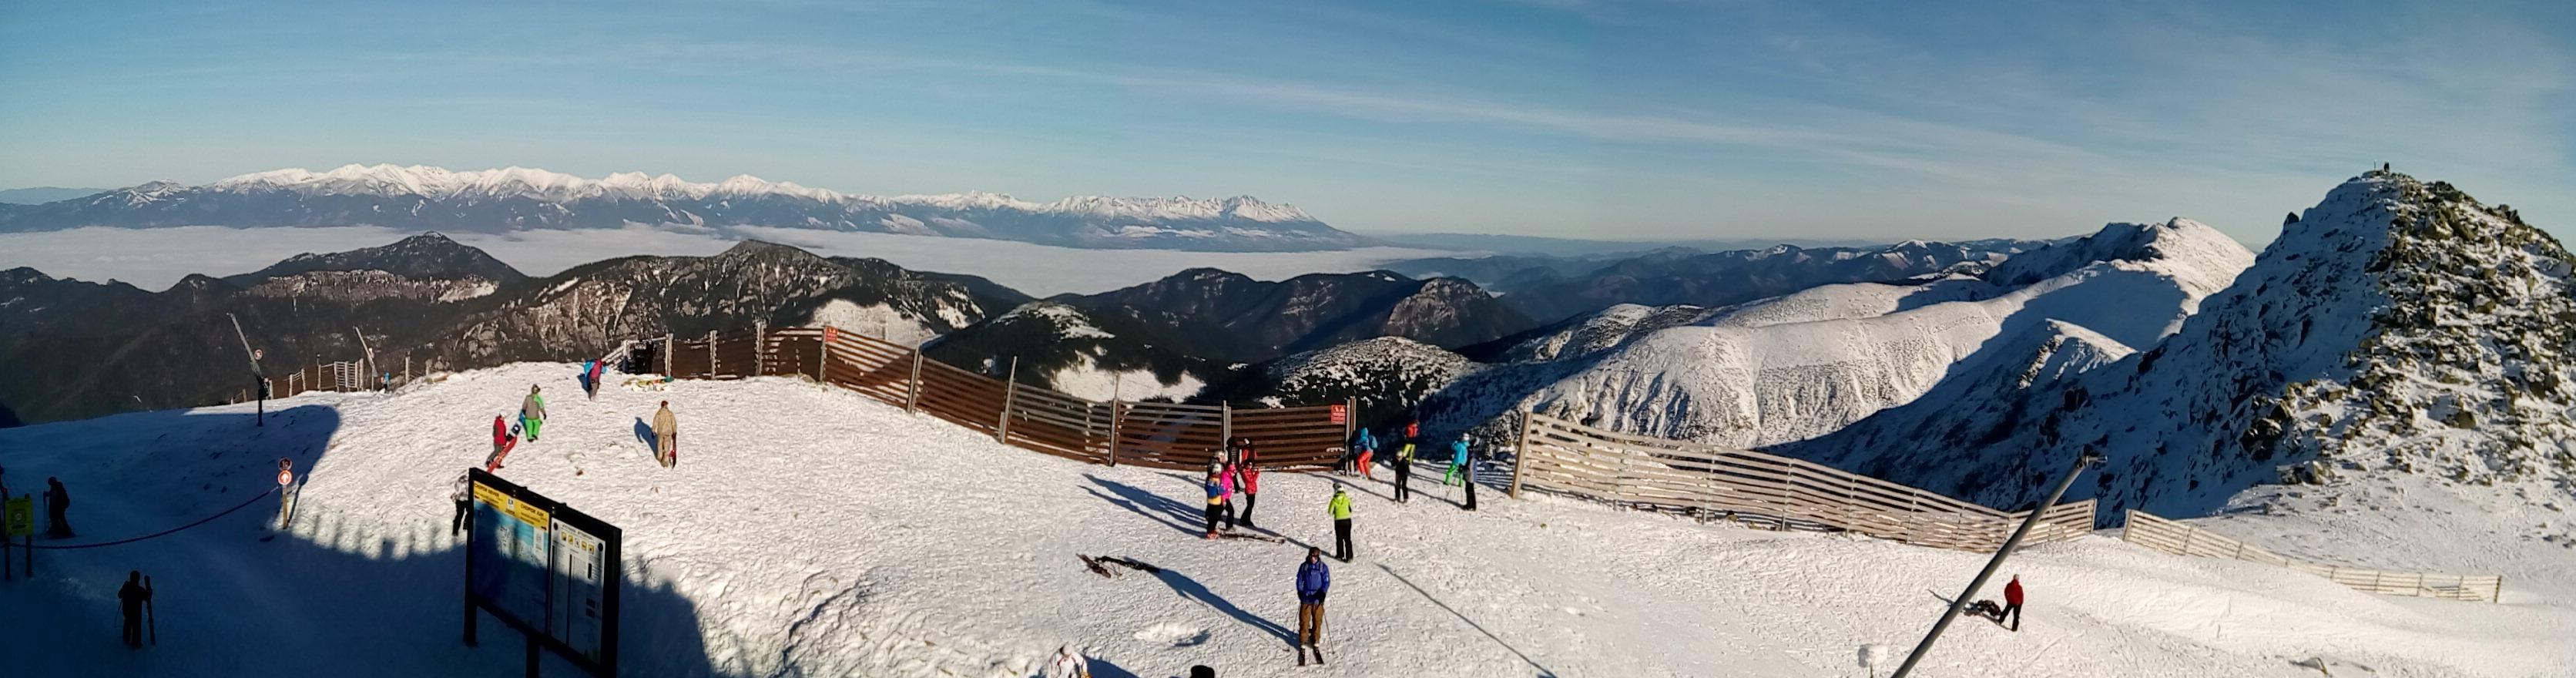 View of High Tatras from Low Tatras